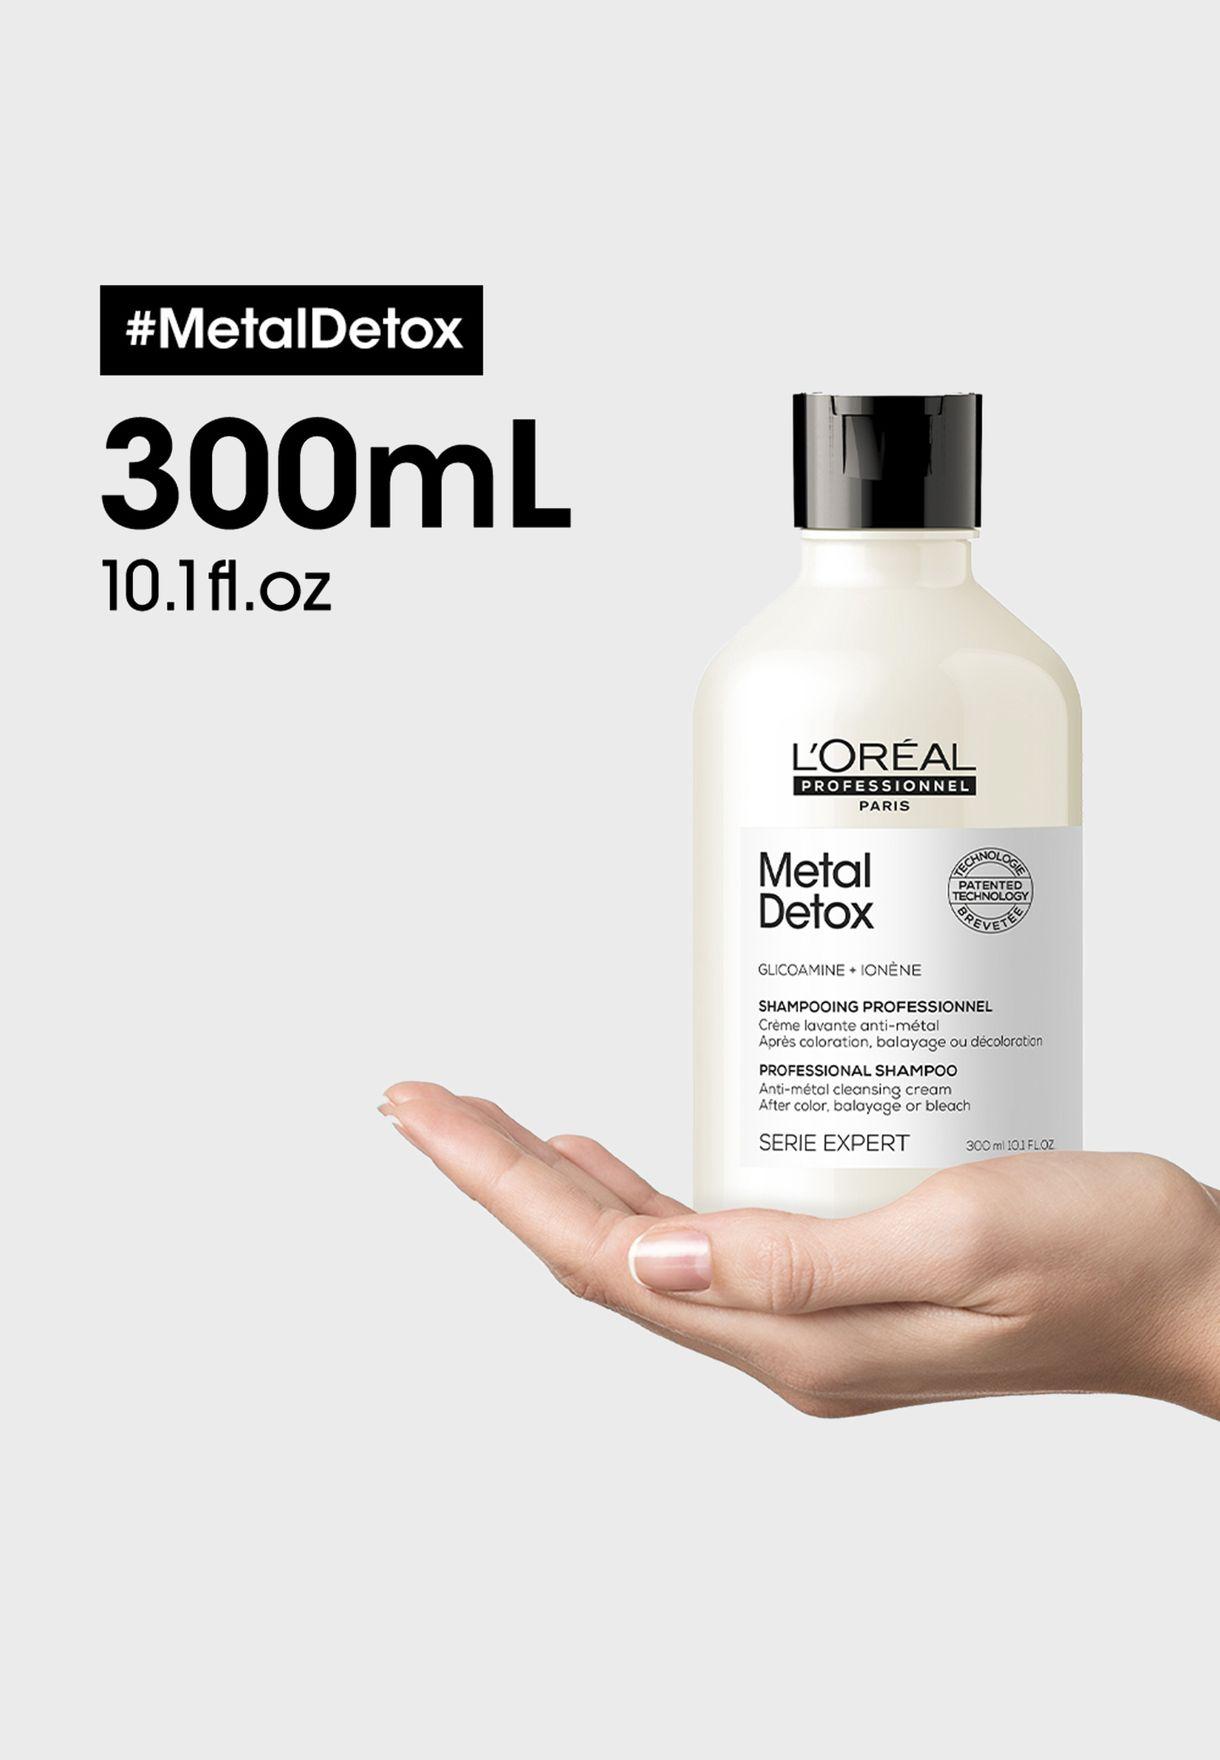 Metal Detox Anti-Metal Cleansing Cream